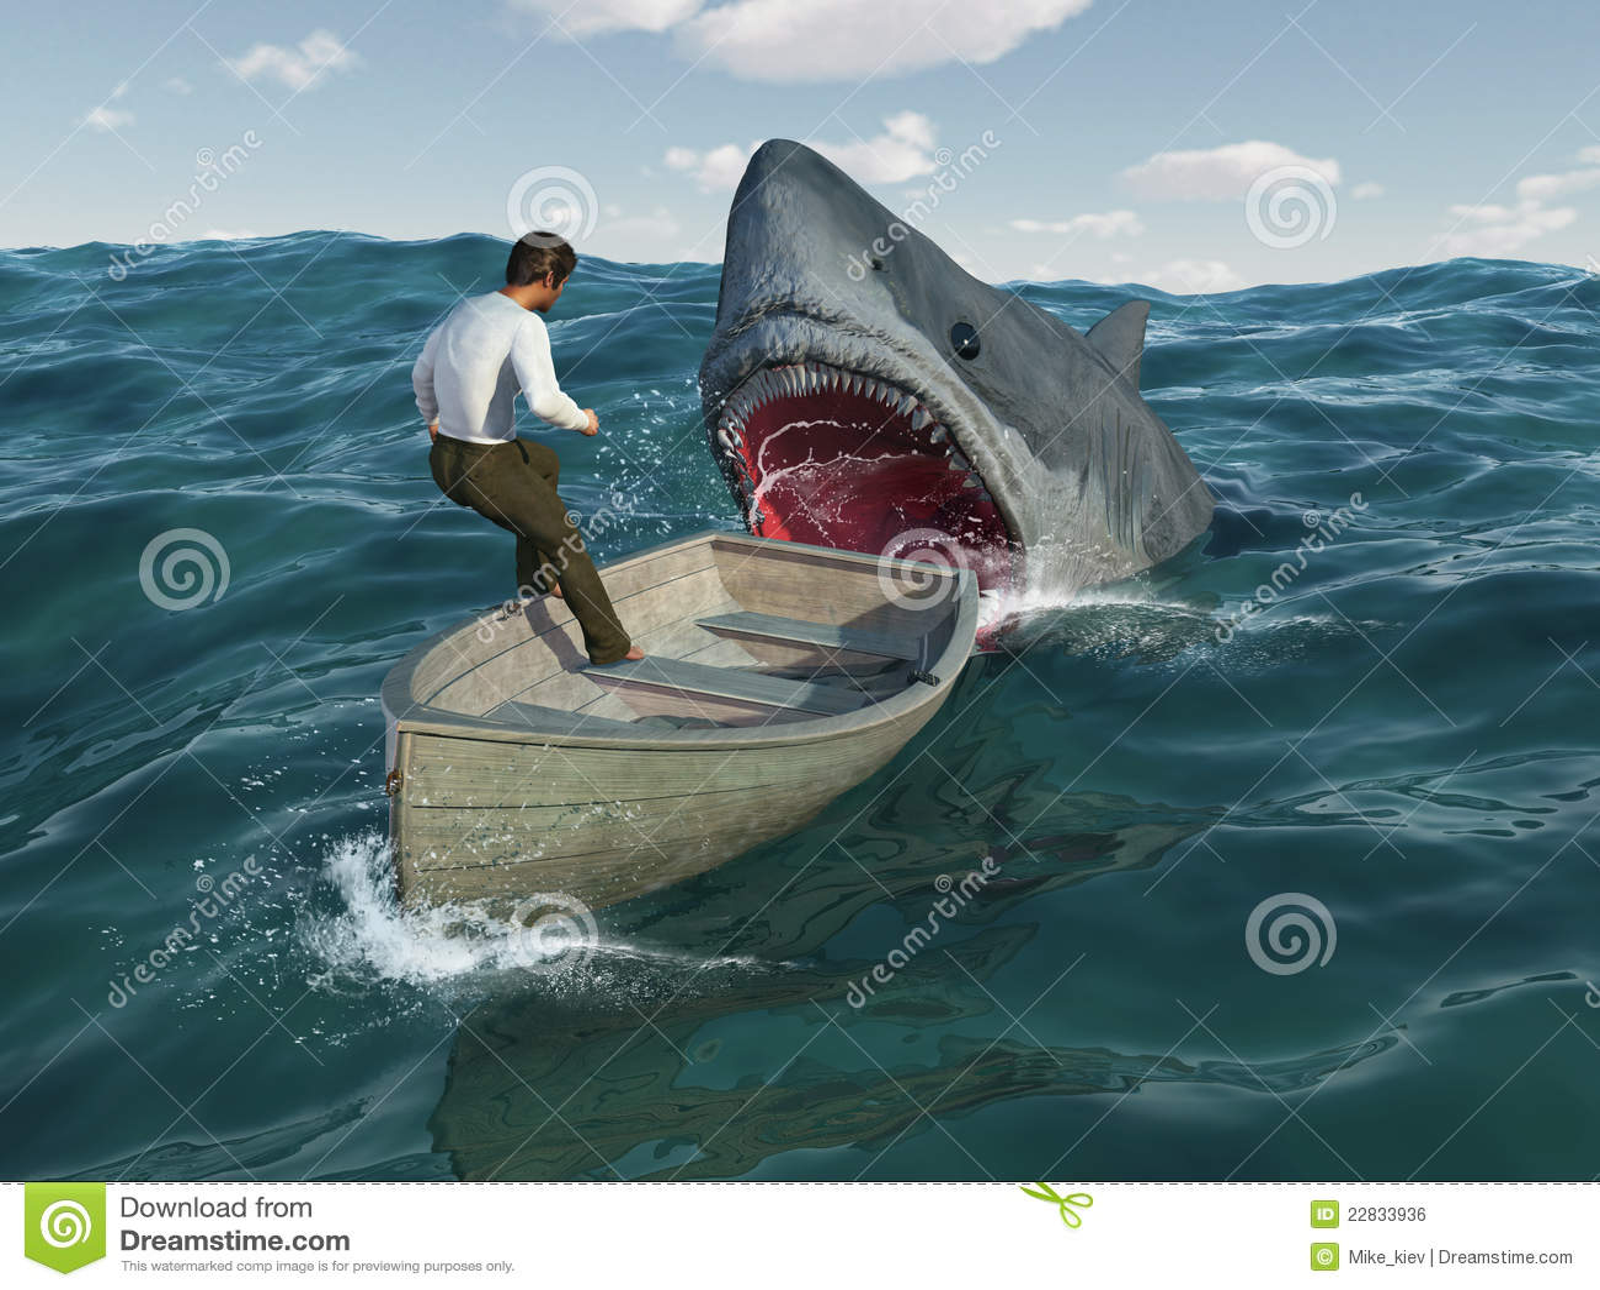 Royalty free stock image shark attacks man in a boat